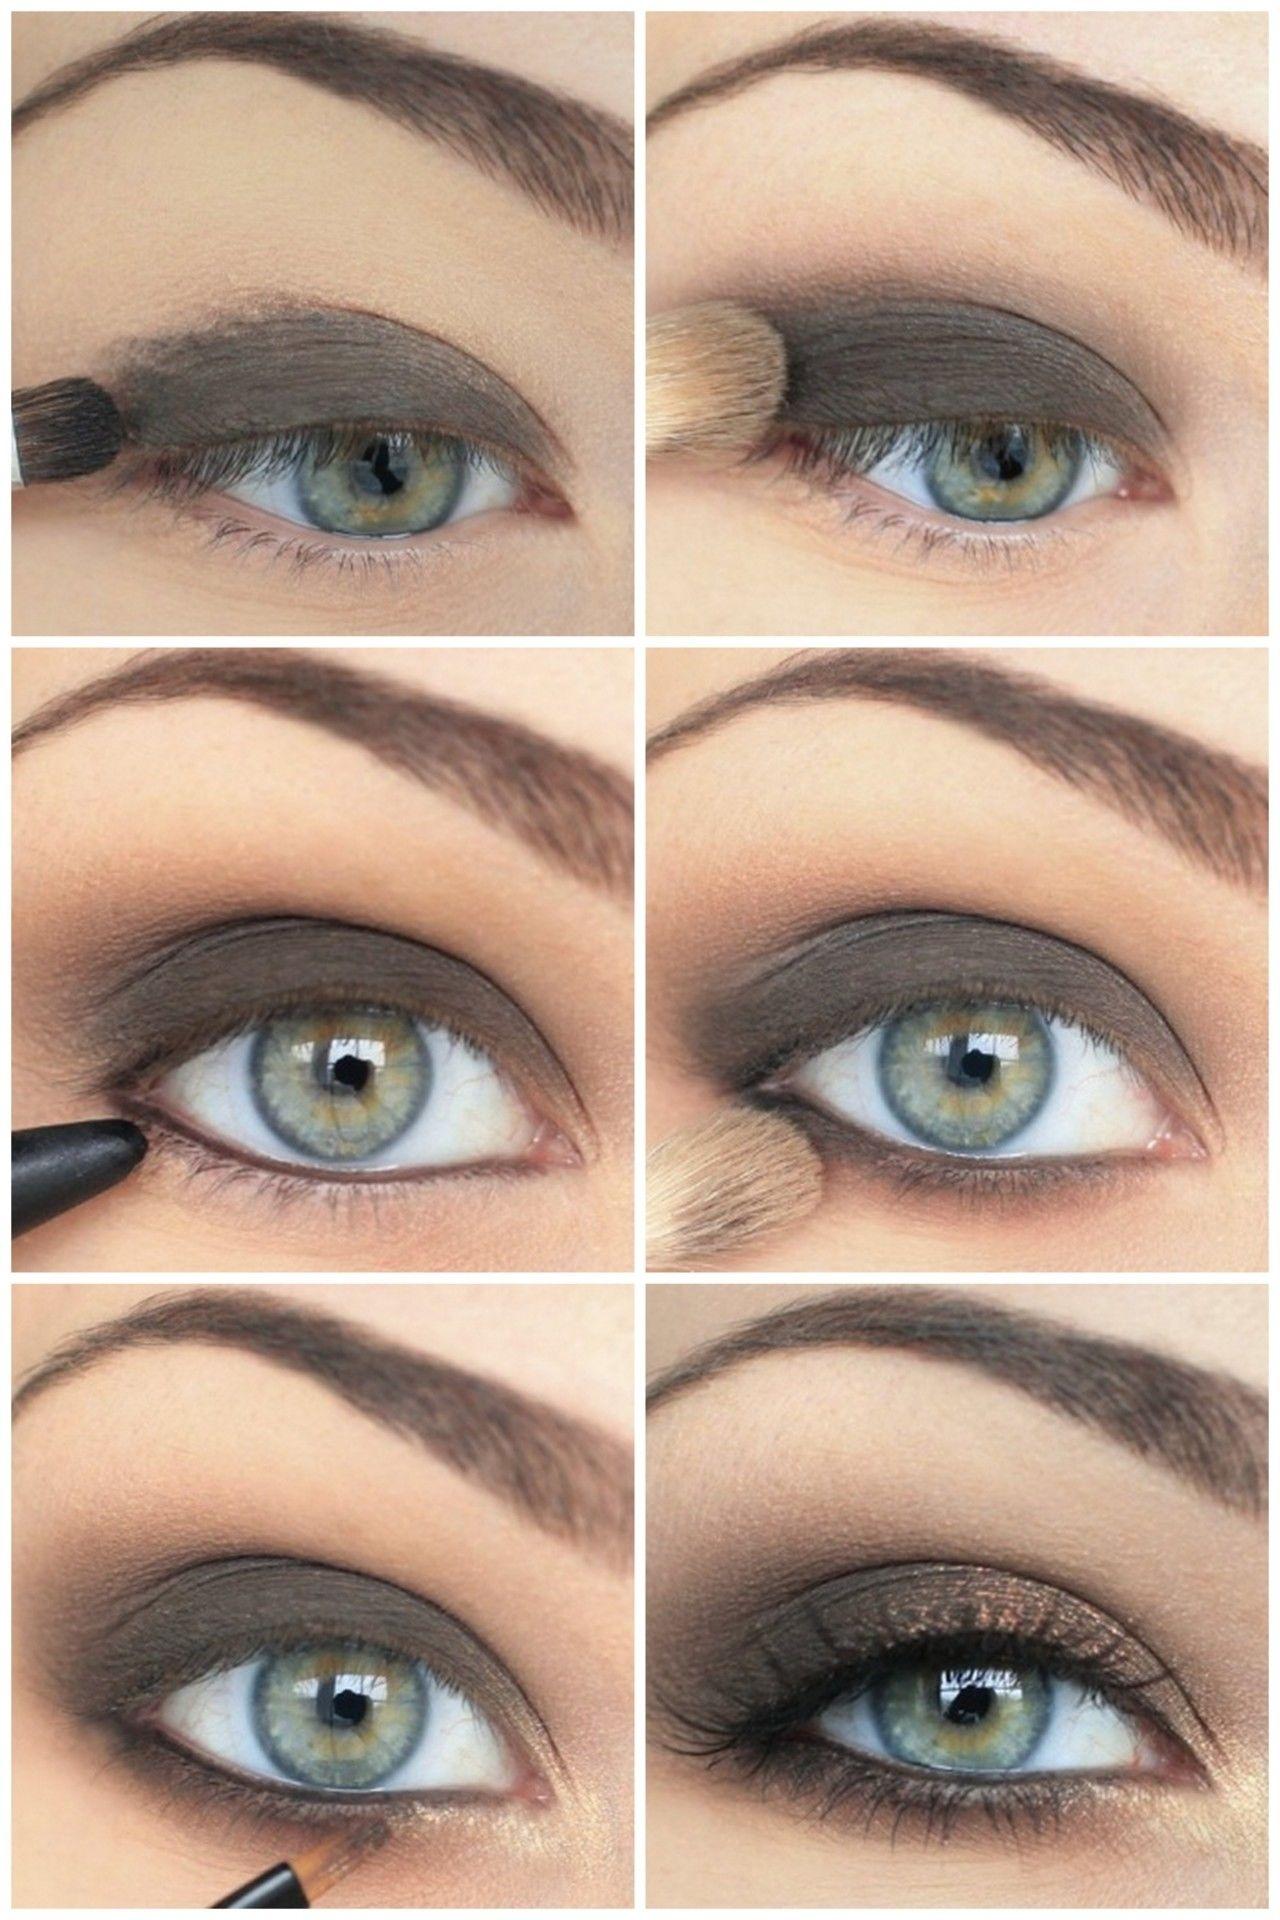 smokey eye makeup looks tumblr - wavy haircut